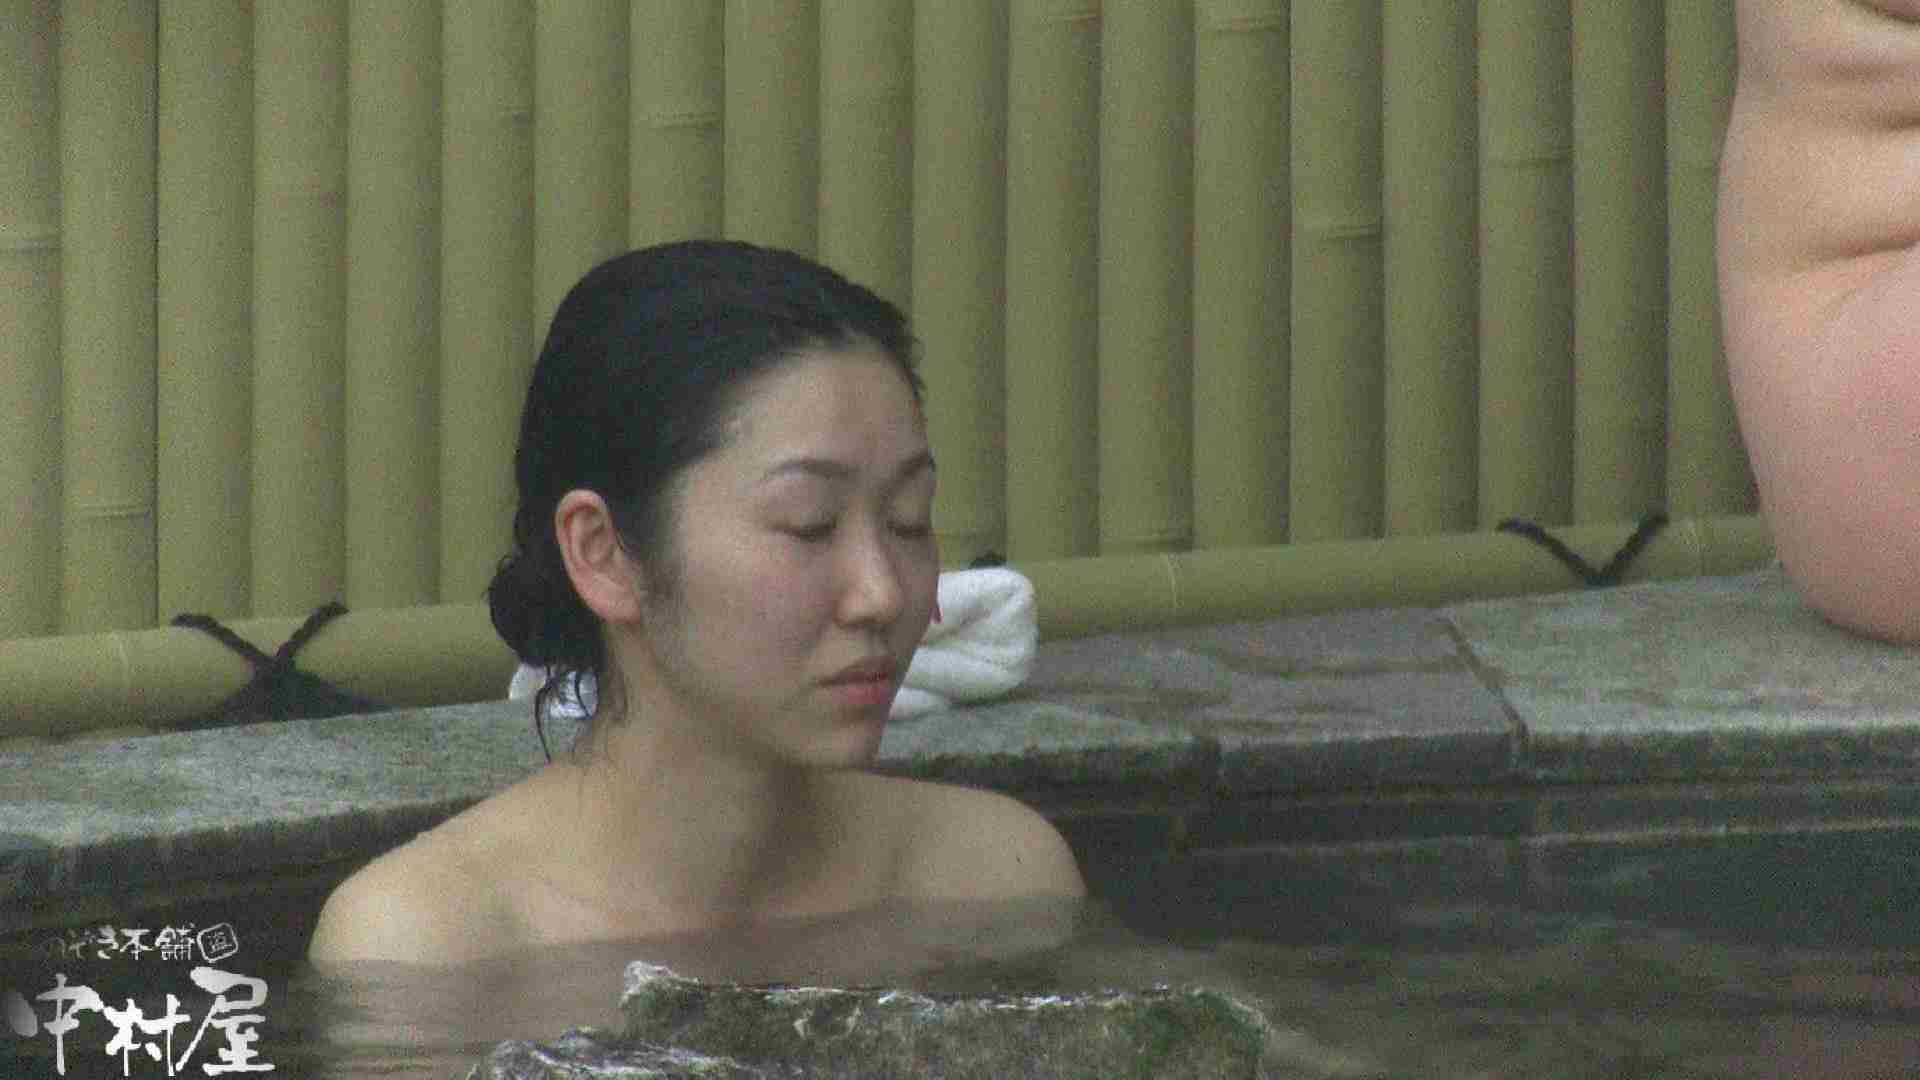 Aquaな露天風呂Vol.917 OLセックス  102画像 48